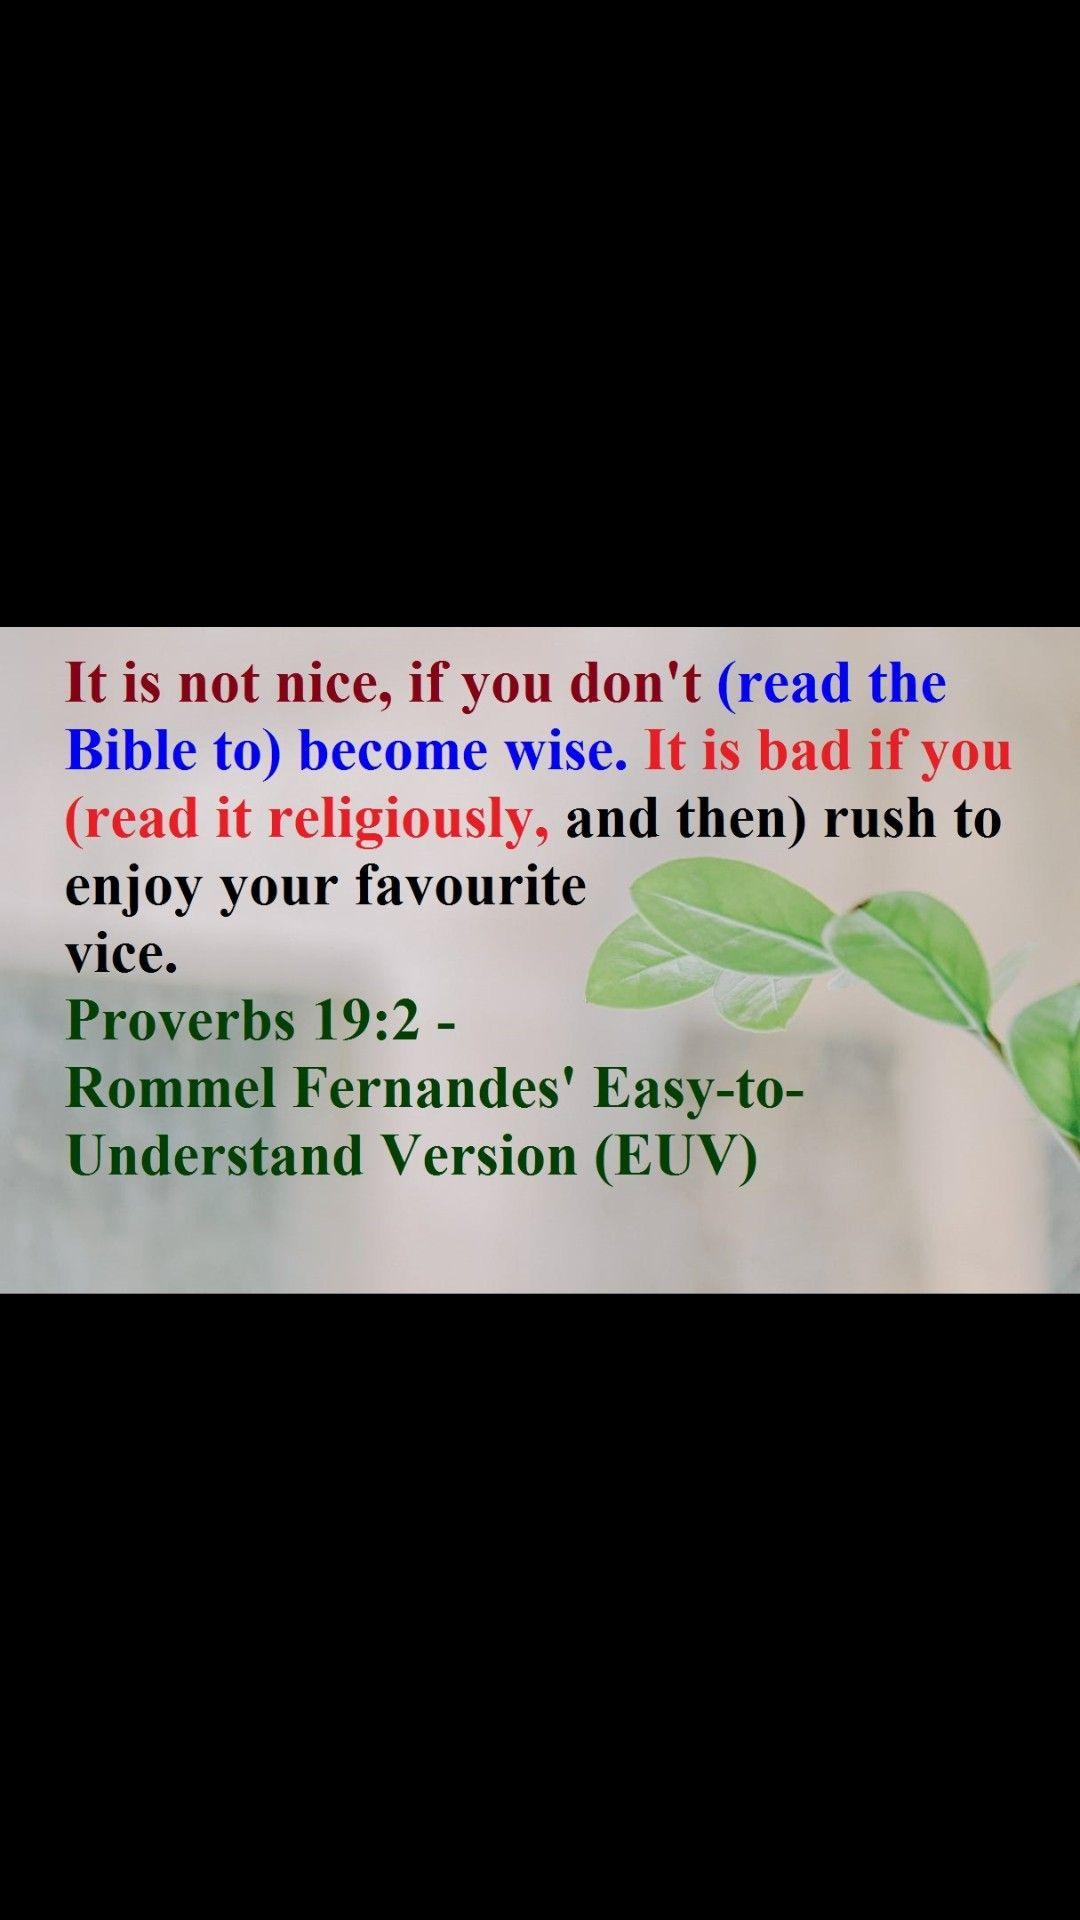 Proverb 19 2 Hymn Of Praise Paraphrase Prov 14